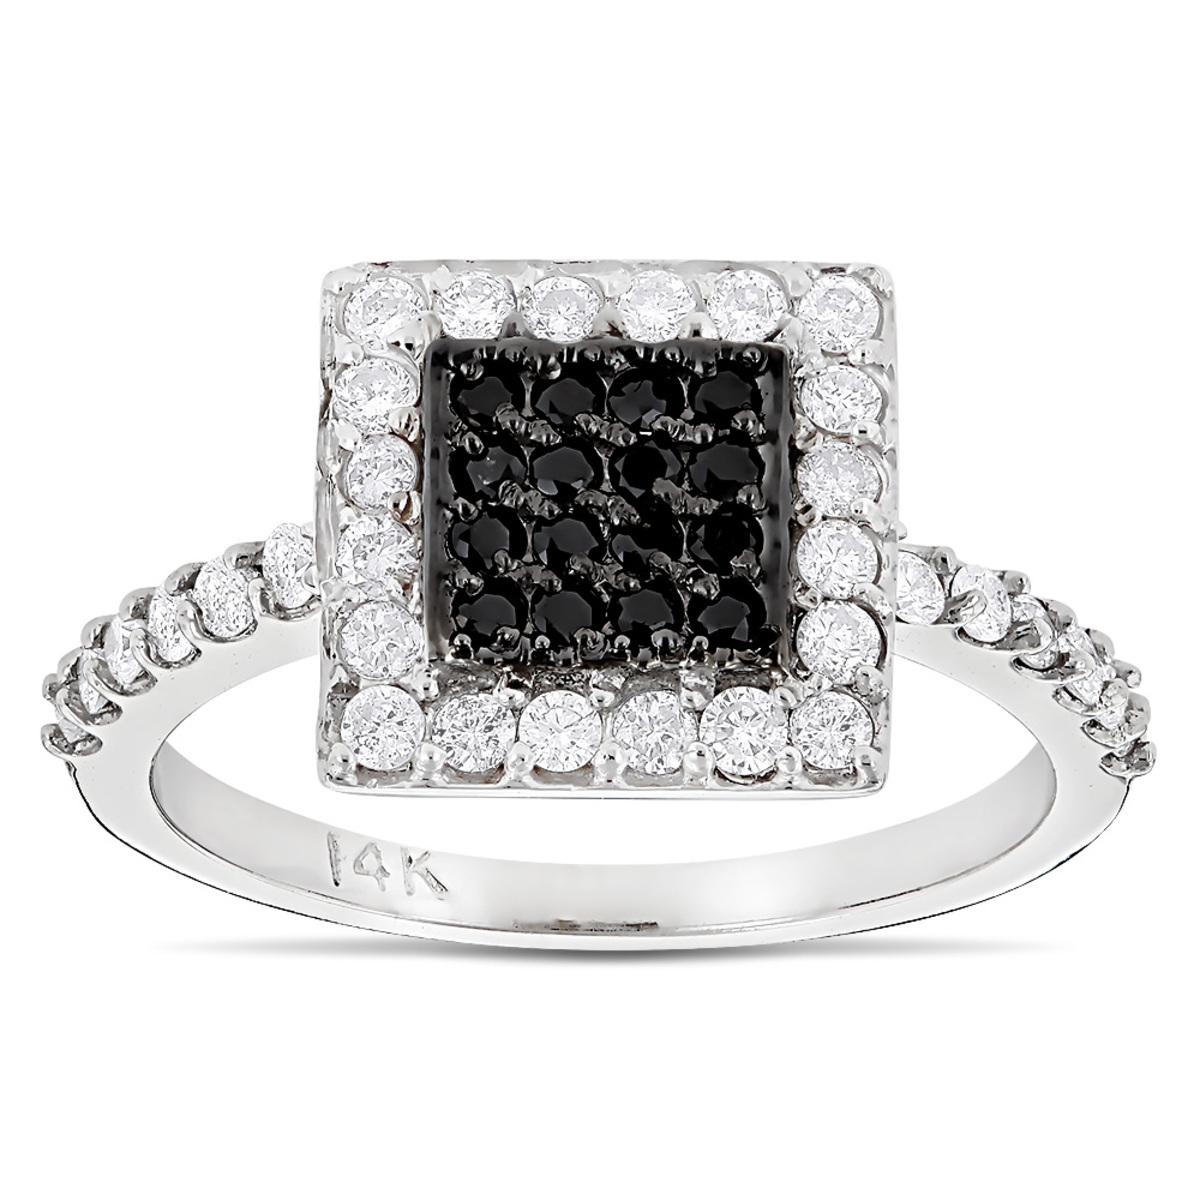 14K Gold White and Black Diamond Ring For Women 0.62ct